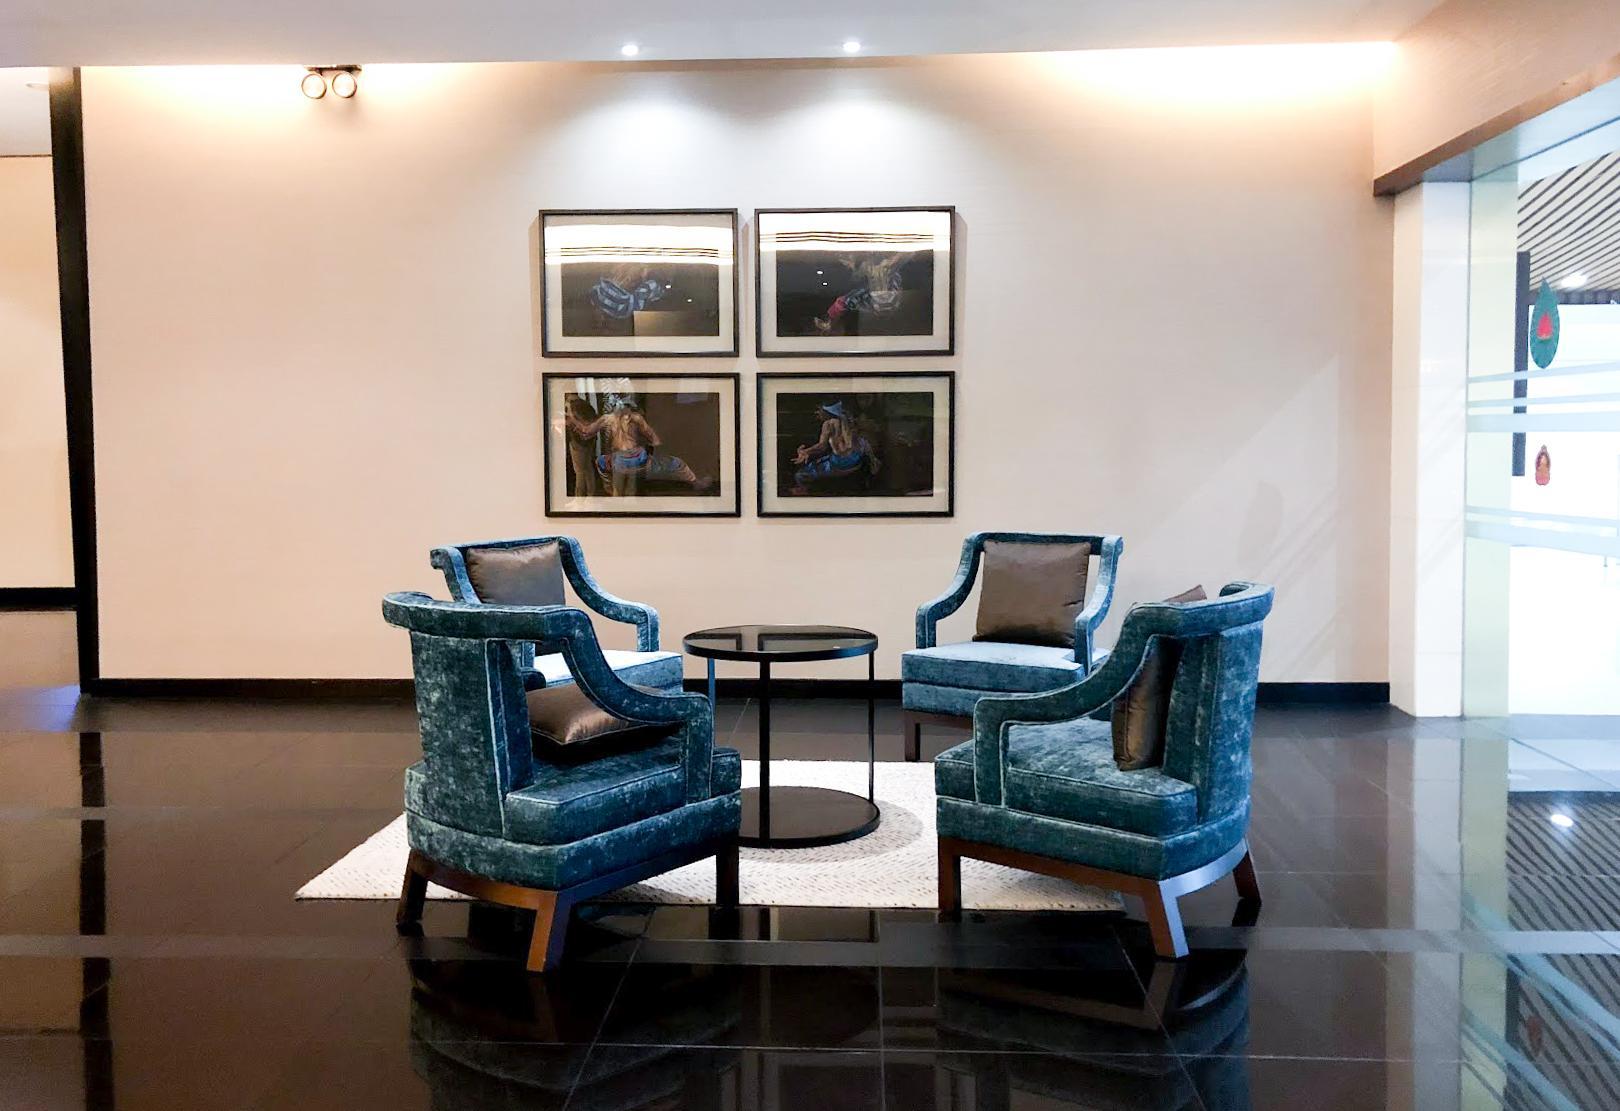 Malaysia Airlines Satellite Golden Lounge Kuala Lumpur waiting area